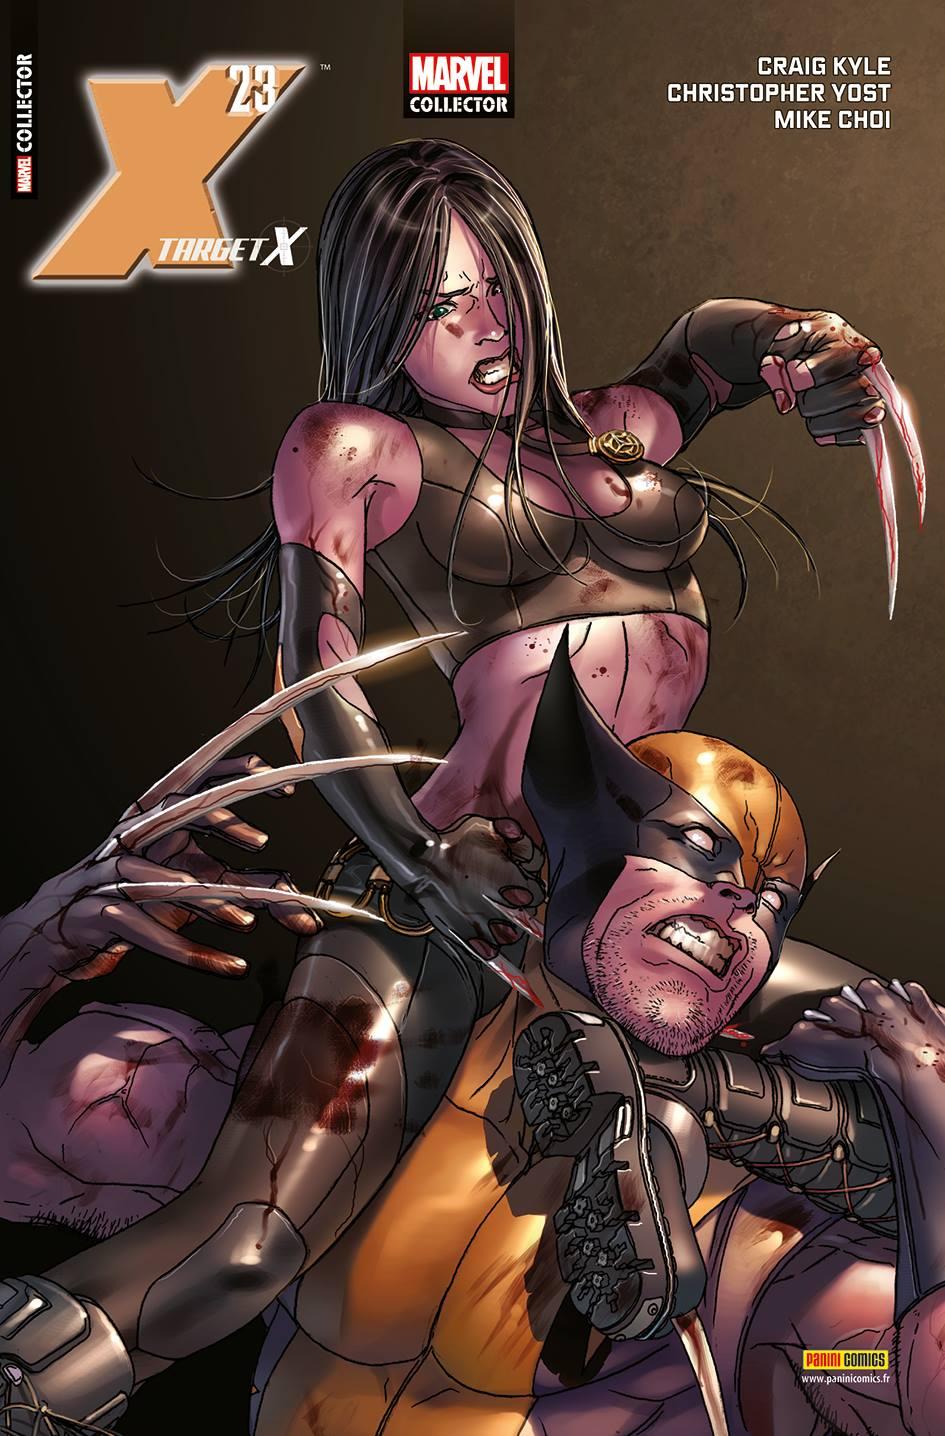 MARVEL COLLECTOR 3 : X-23 - TARGET X